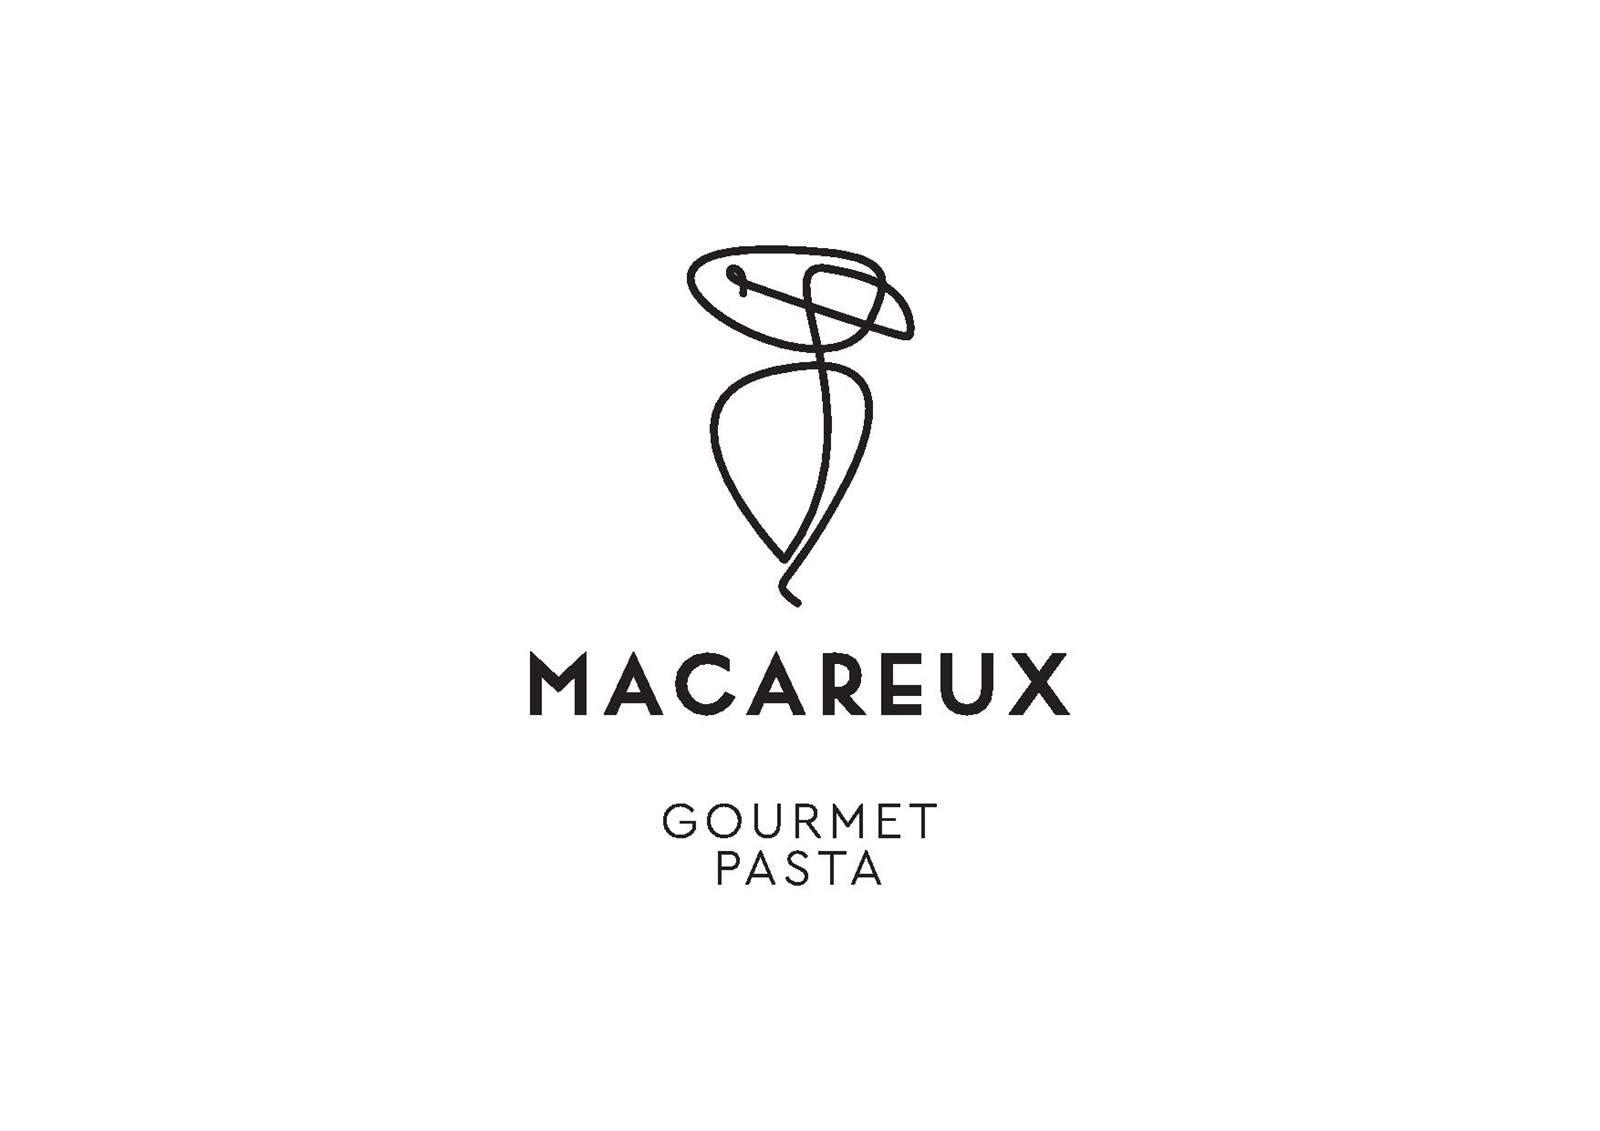 Macareux-Final-Logo-2-page-001-1